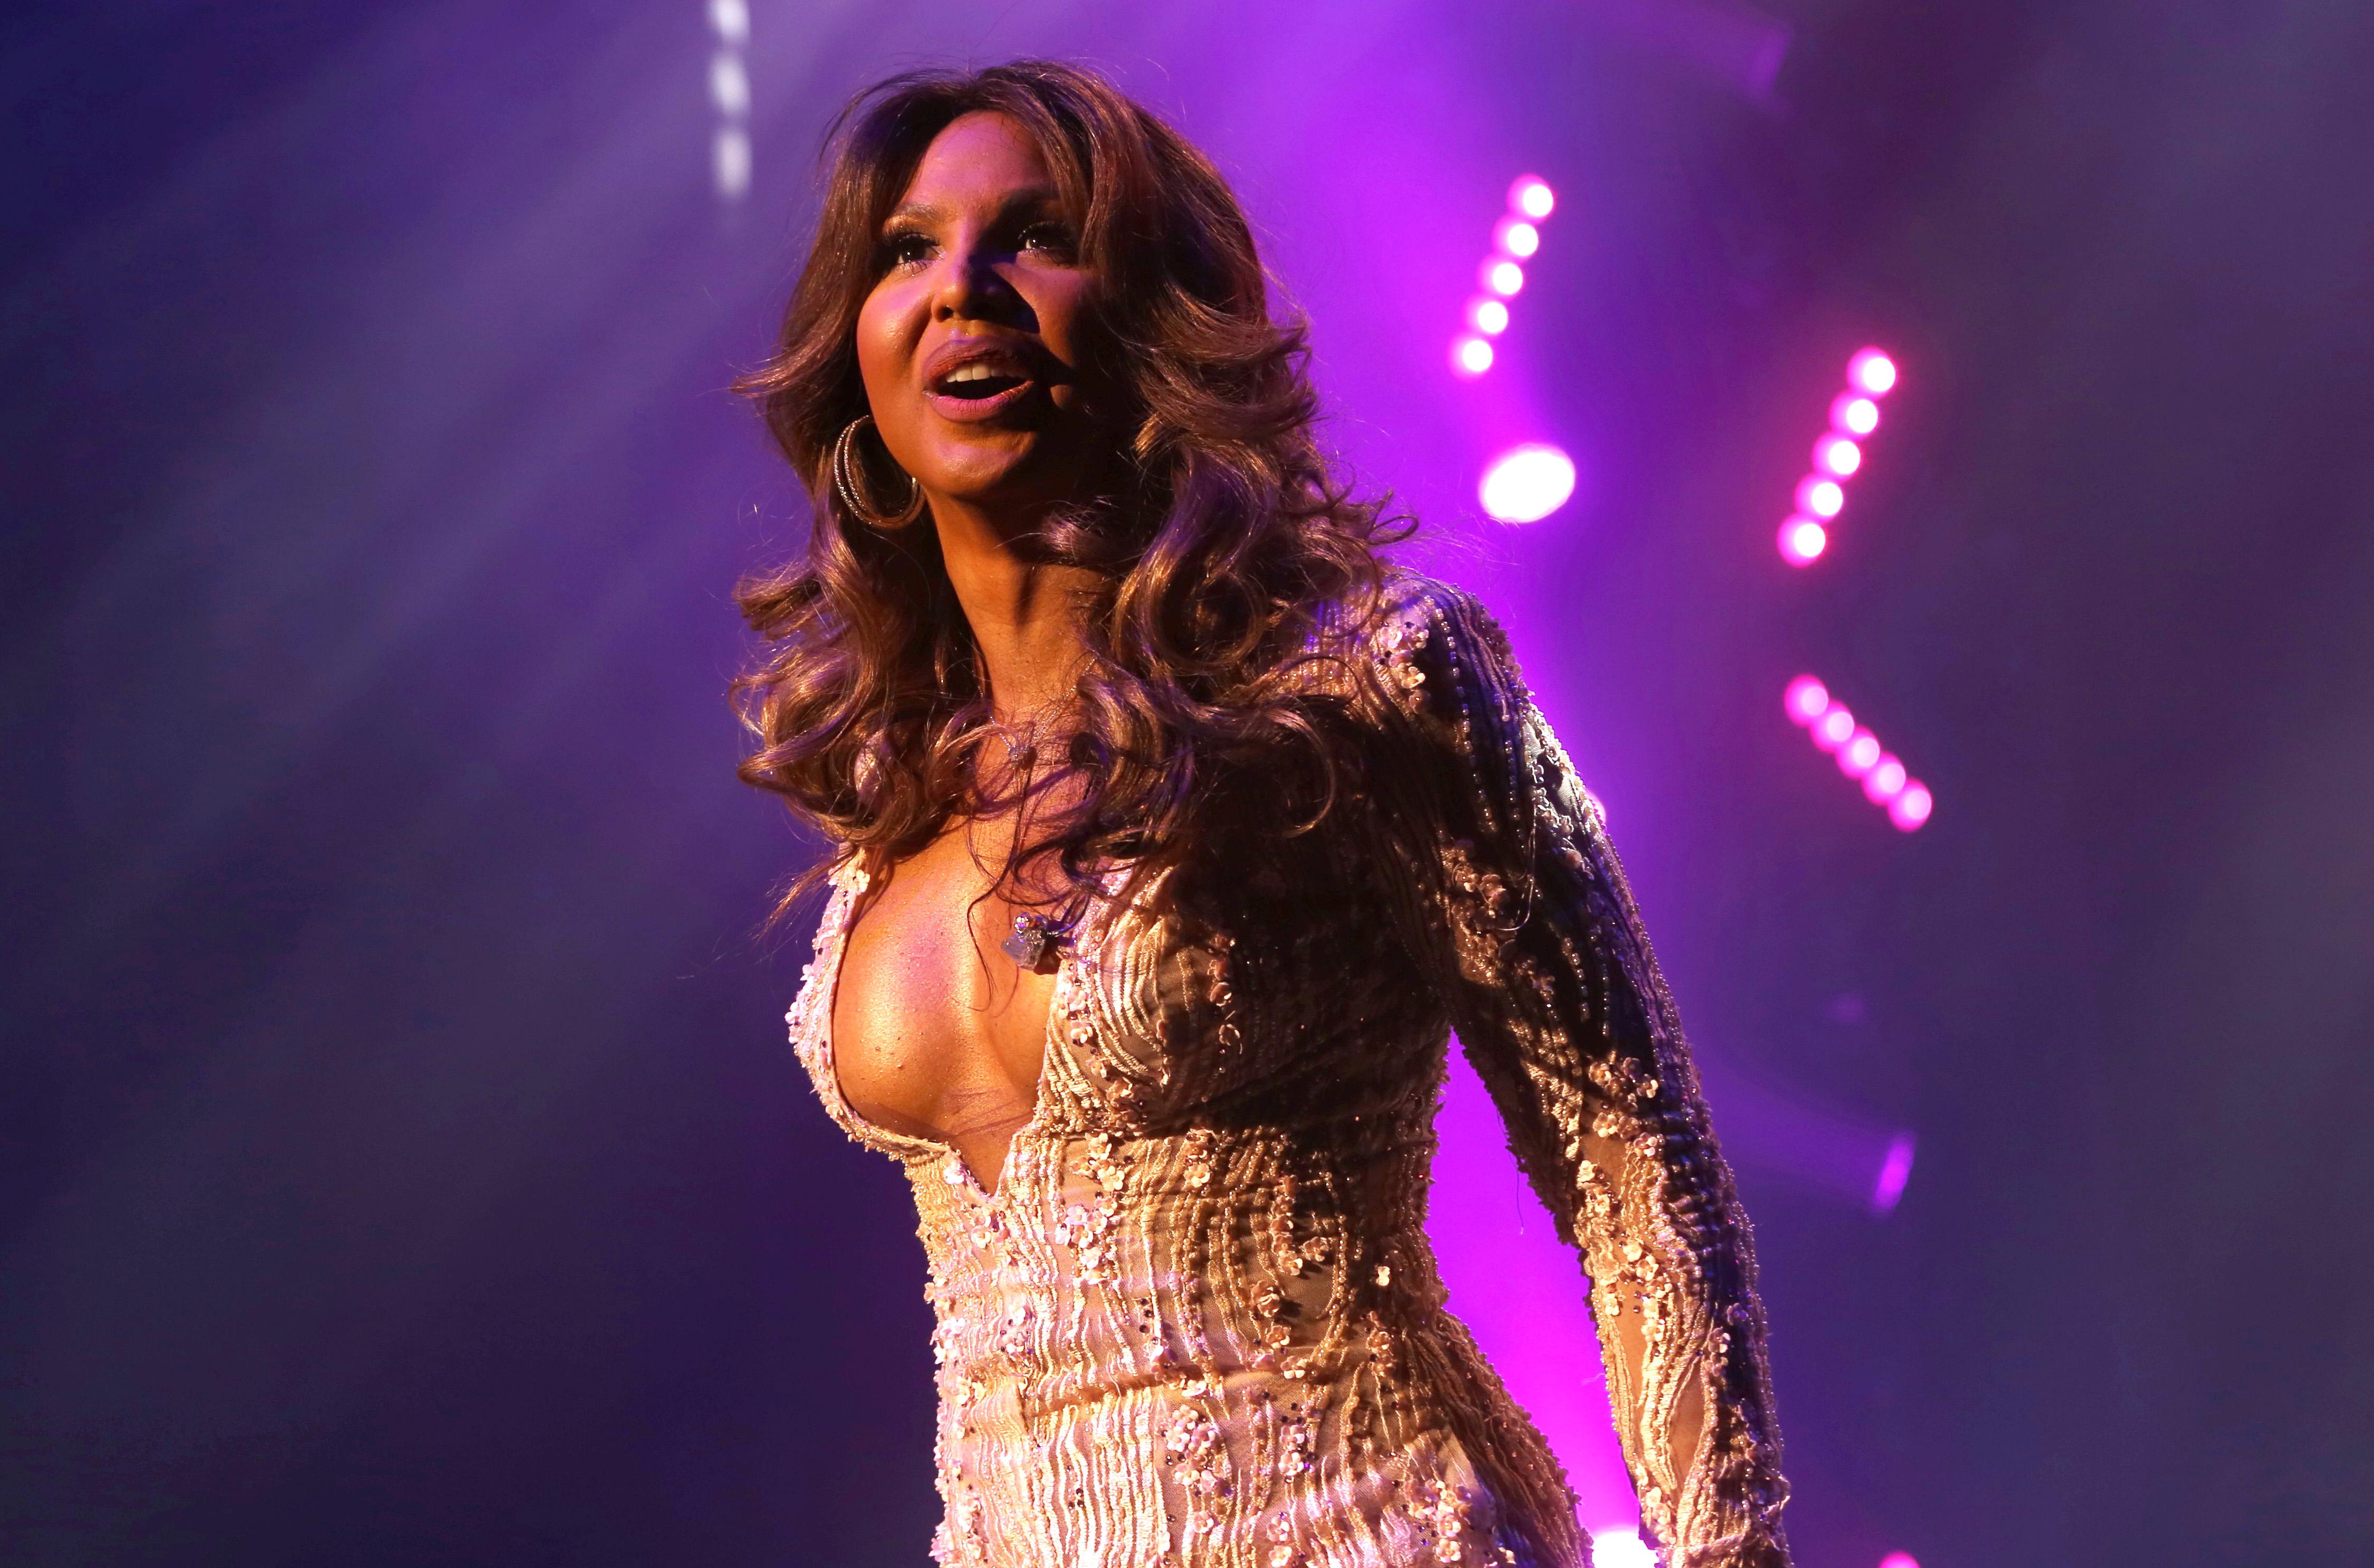 GRAMMY Park Artist Spotlight: Toni Braxton performs live